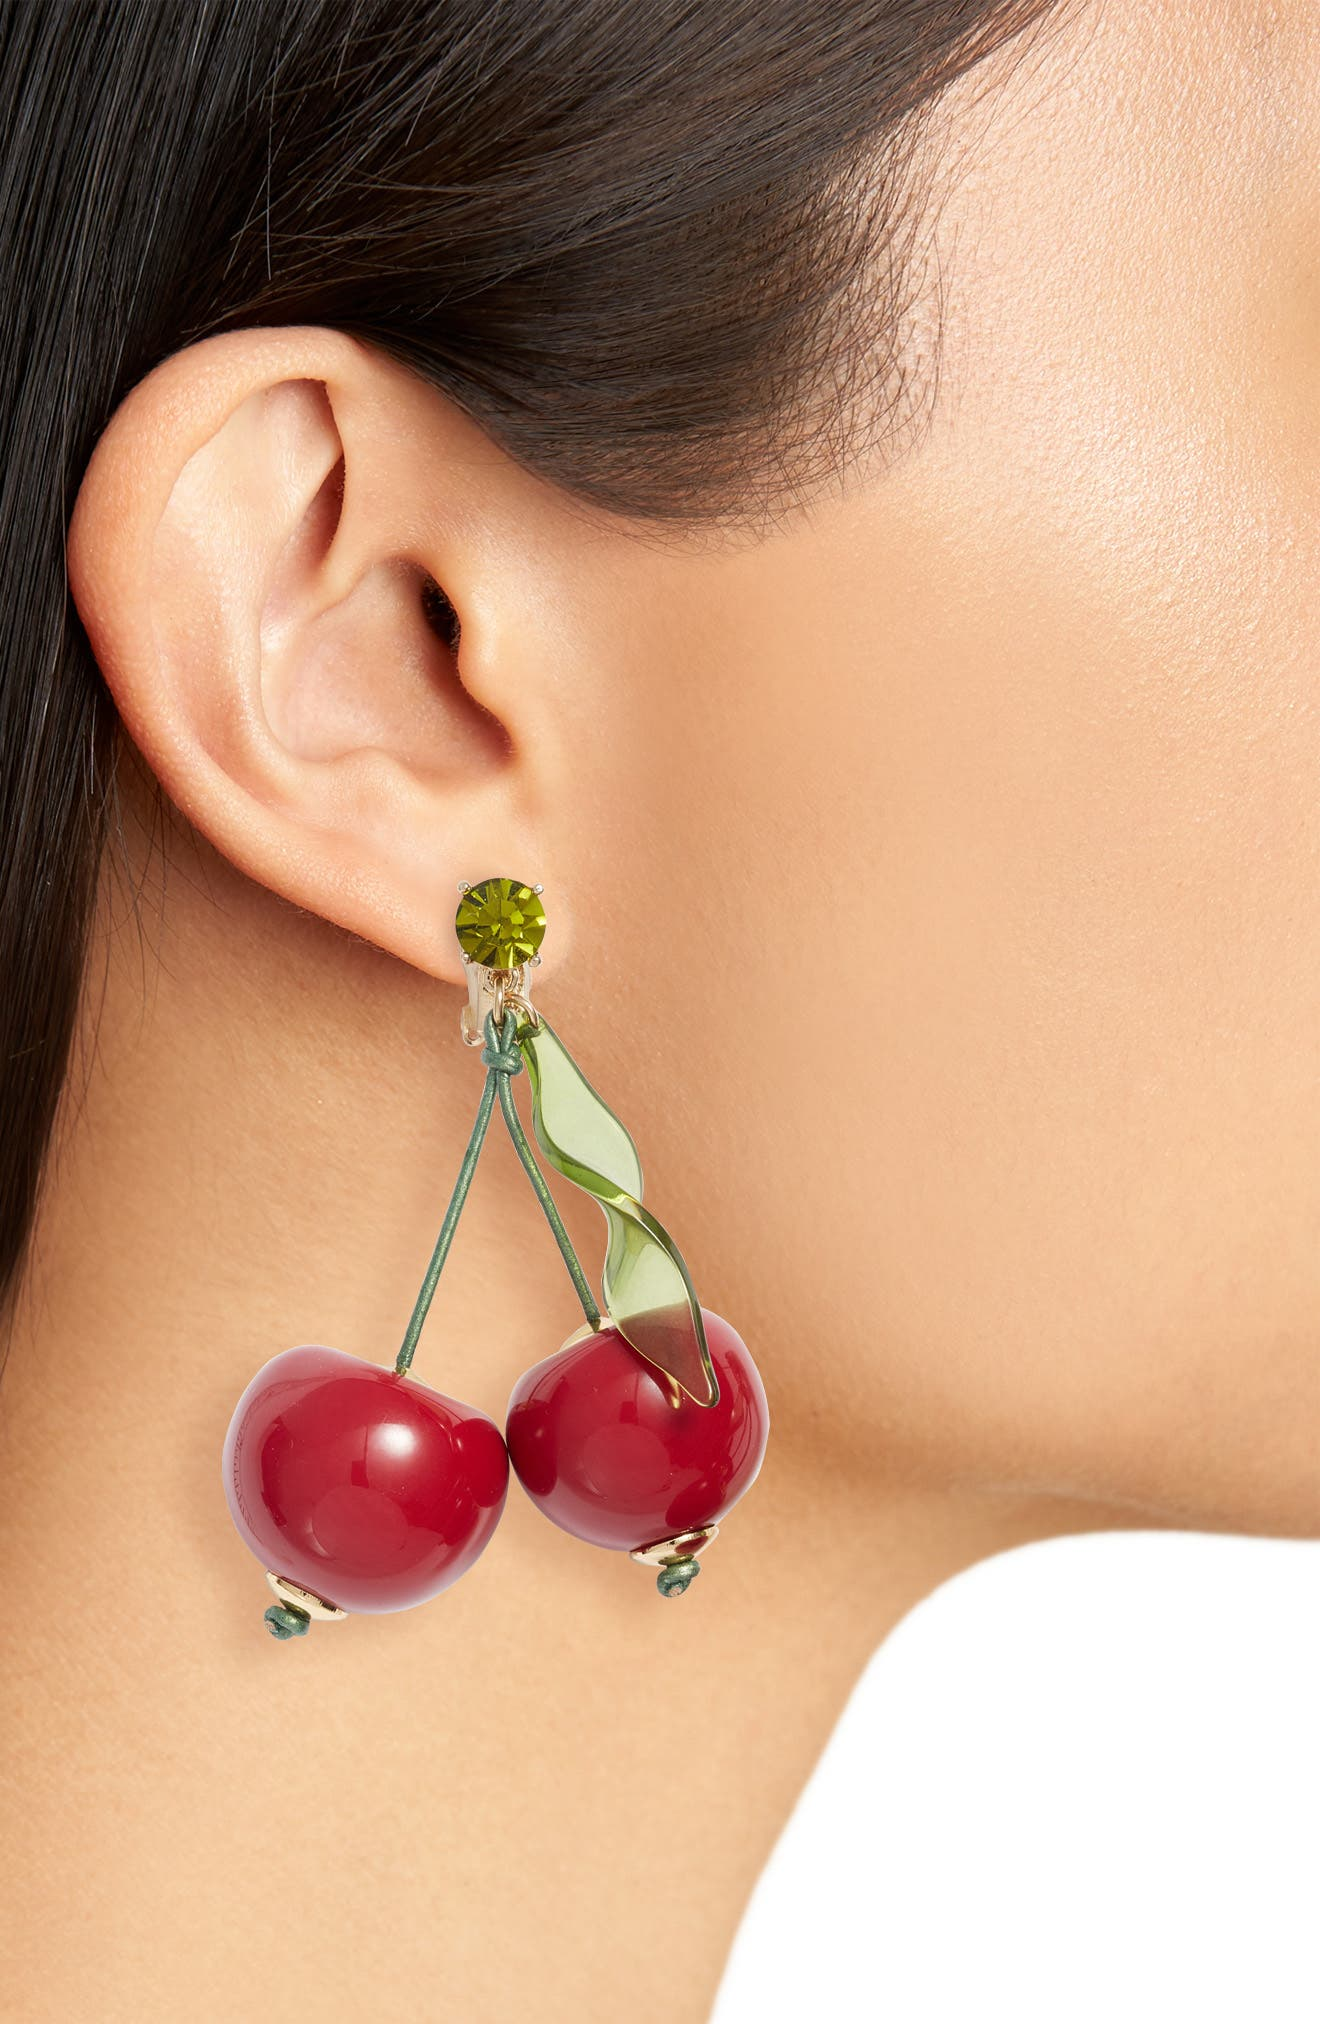 Kate Spade New York Ma Cherie Cherry Clip Drop Earrings Nordstrom